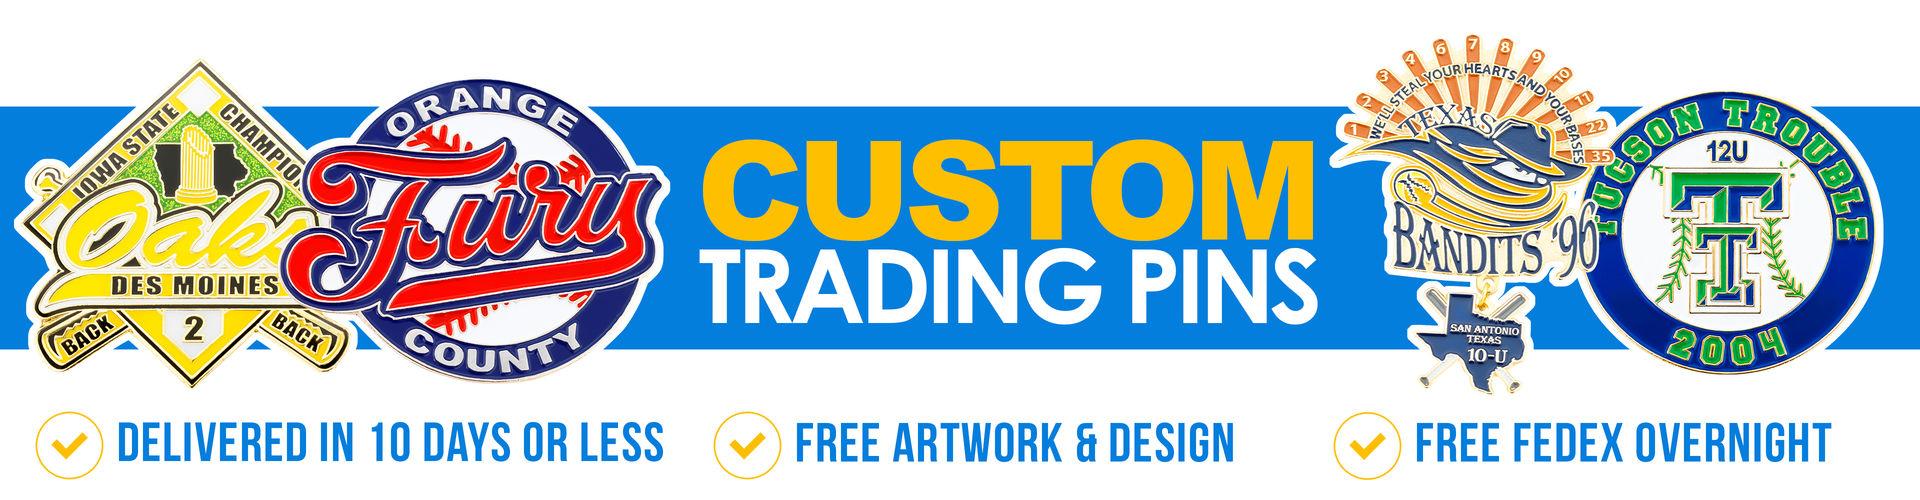 Custom Trading Pins